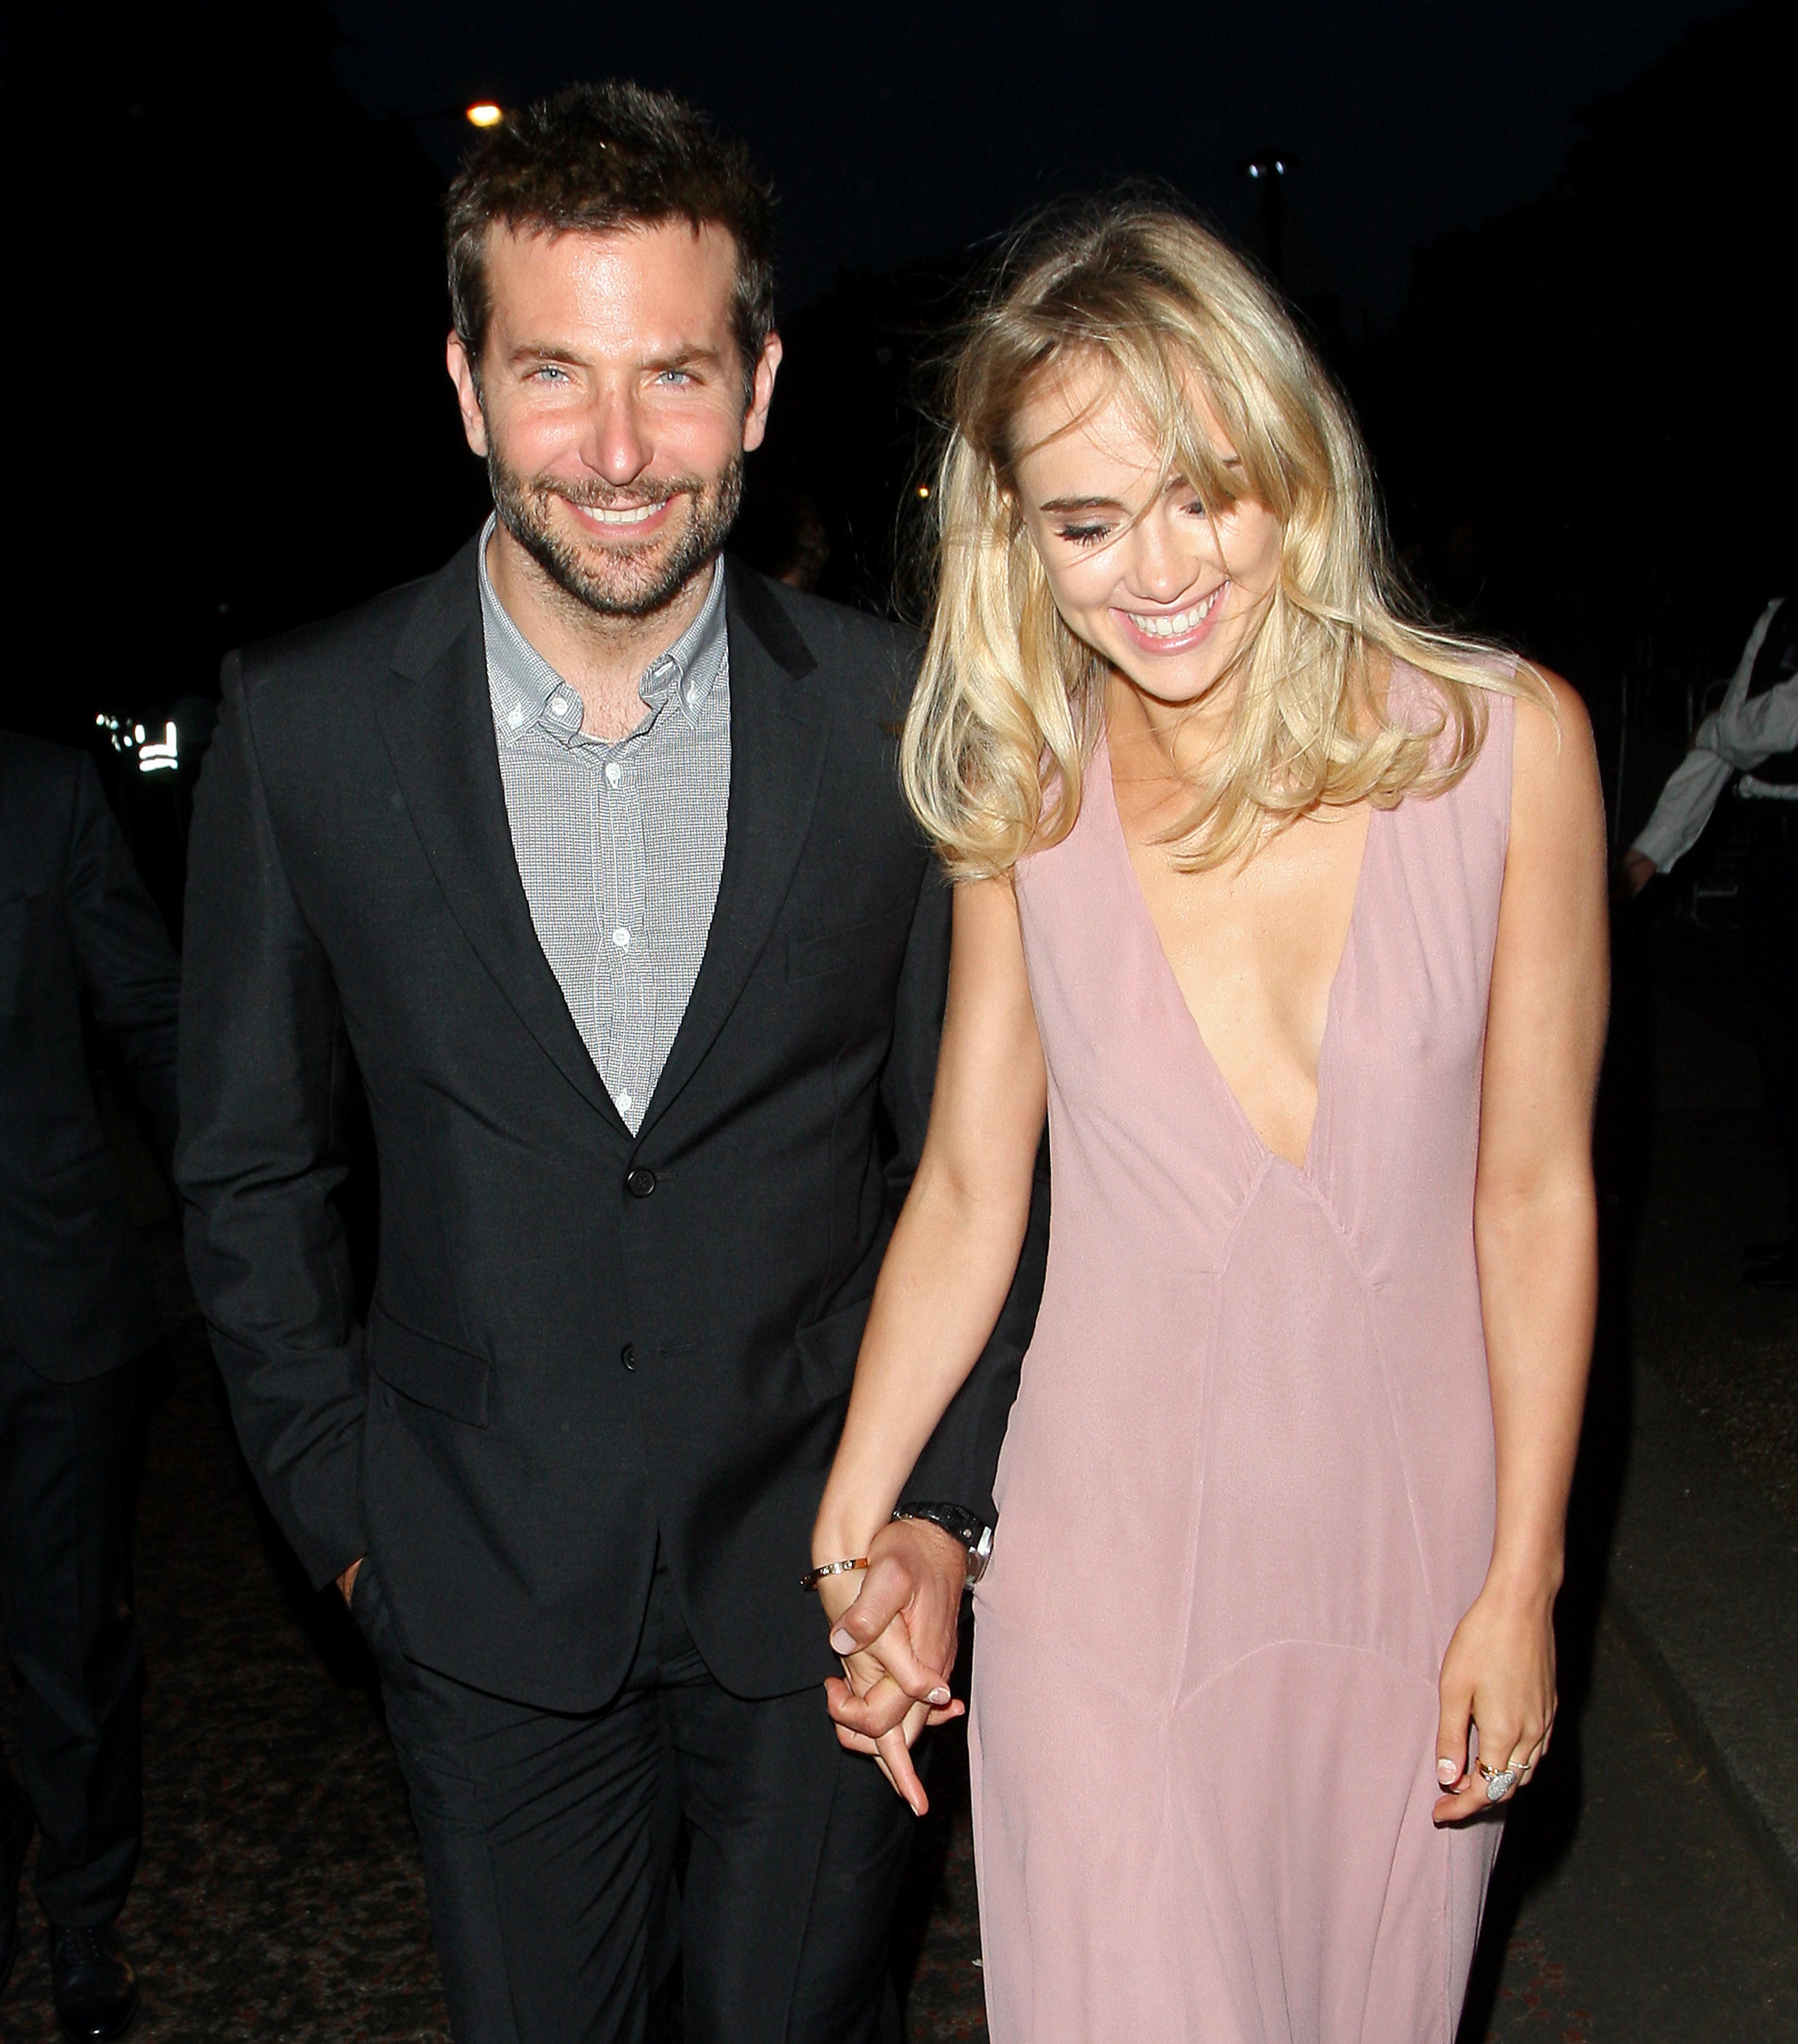 Bradley Cooper and Suki Waterhouse reunite at Coachella: Report